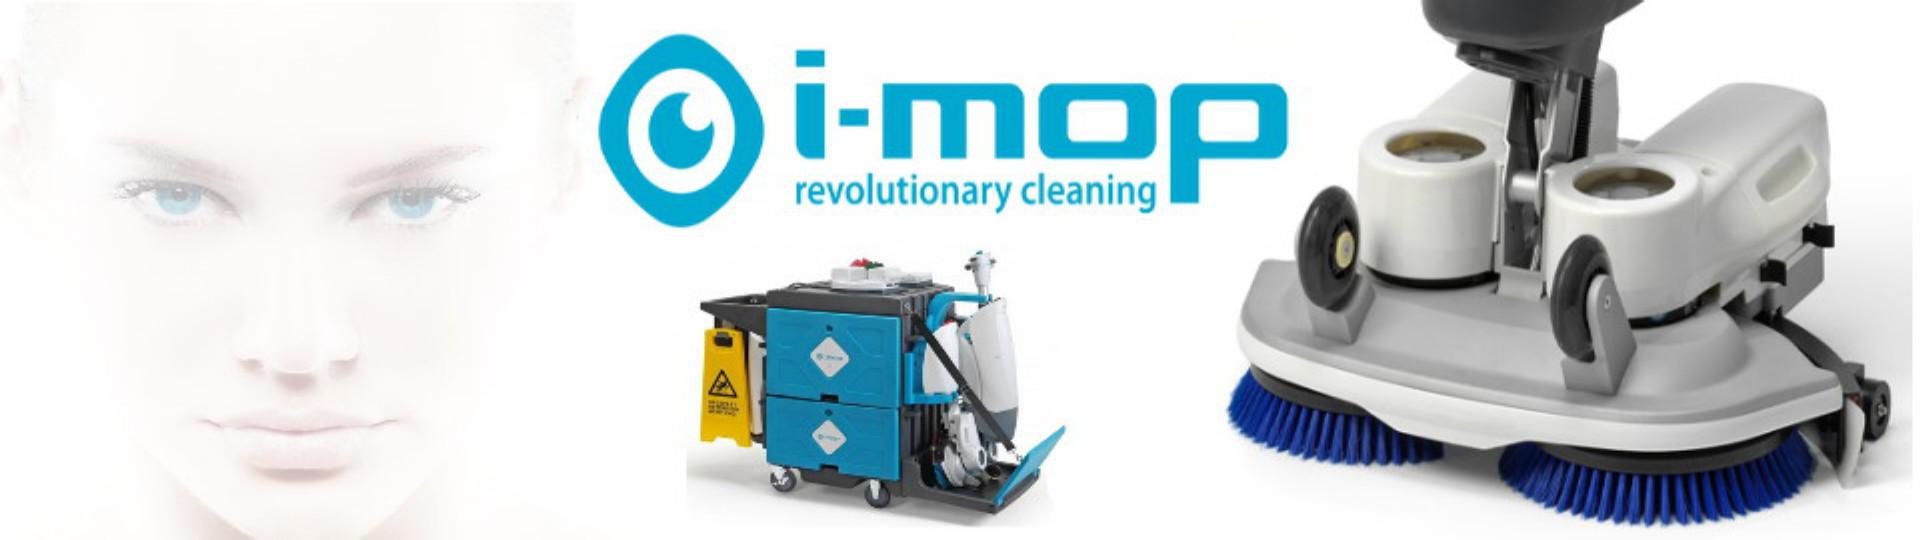 I-Mop Range